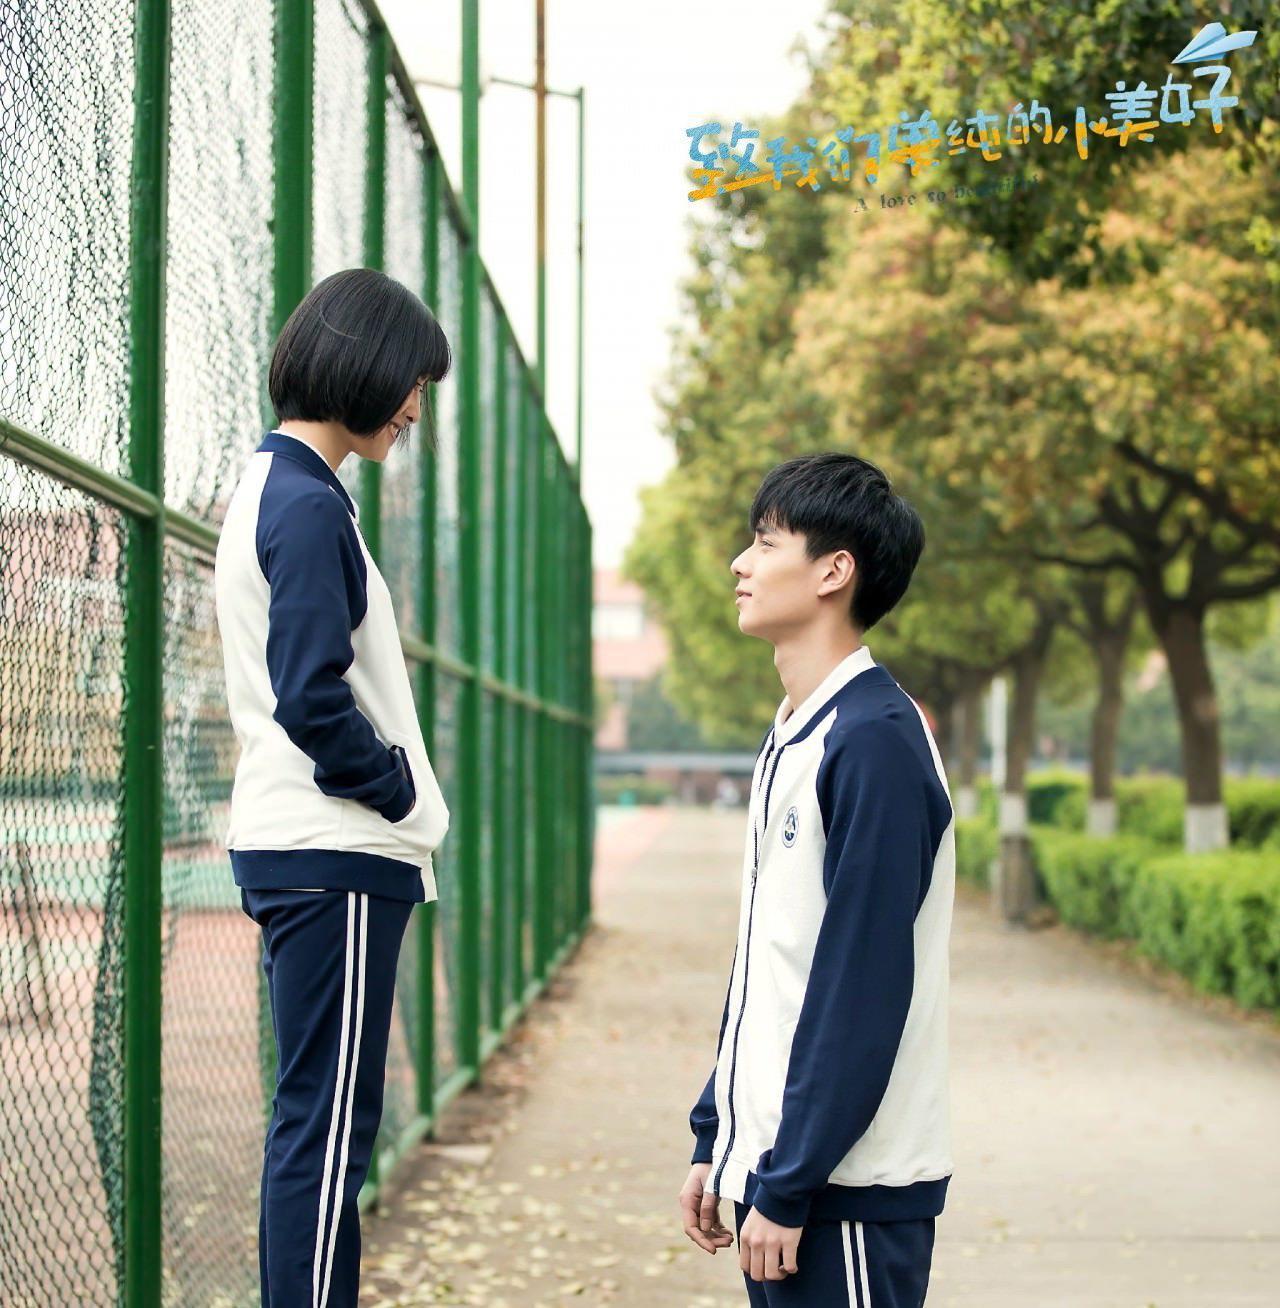 4-top-bo-phim-hay-an-tuong-tren-man-anh-nho-hoa-ngu-2017